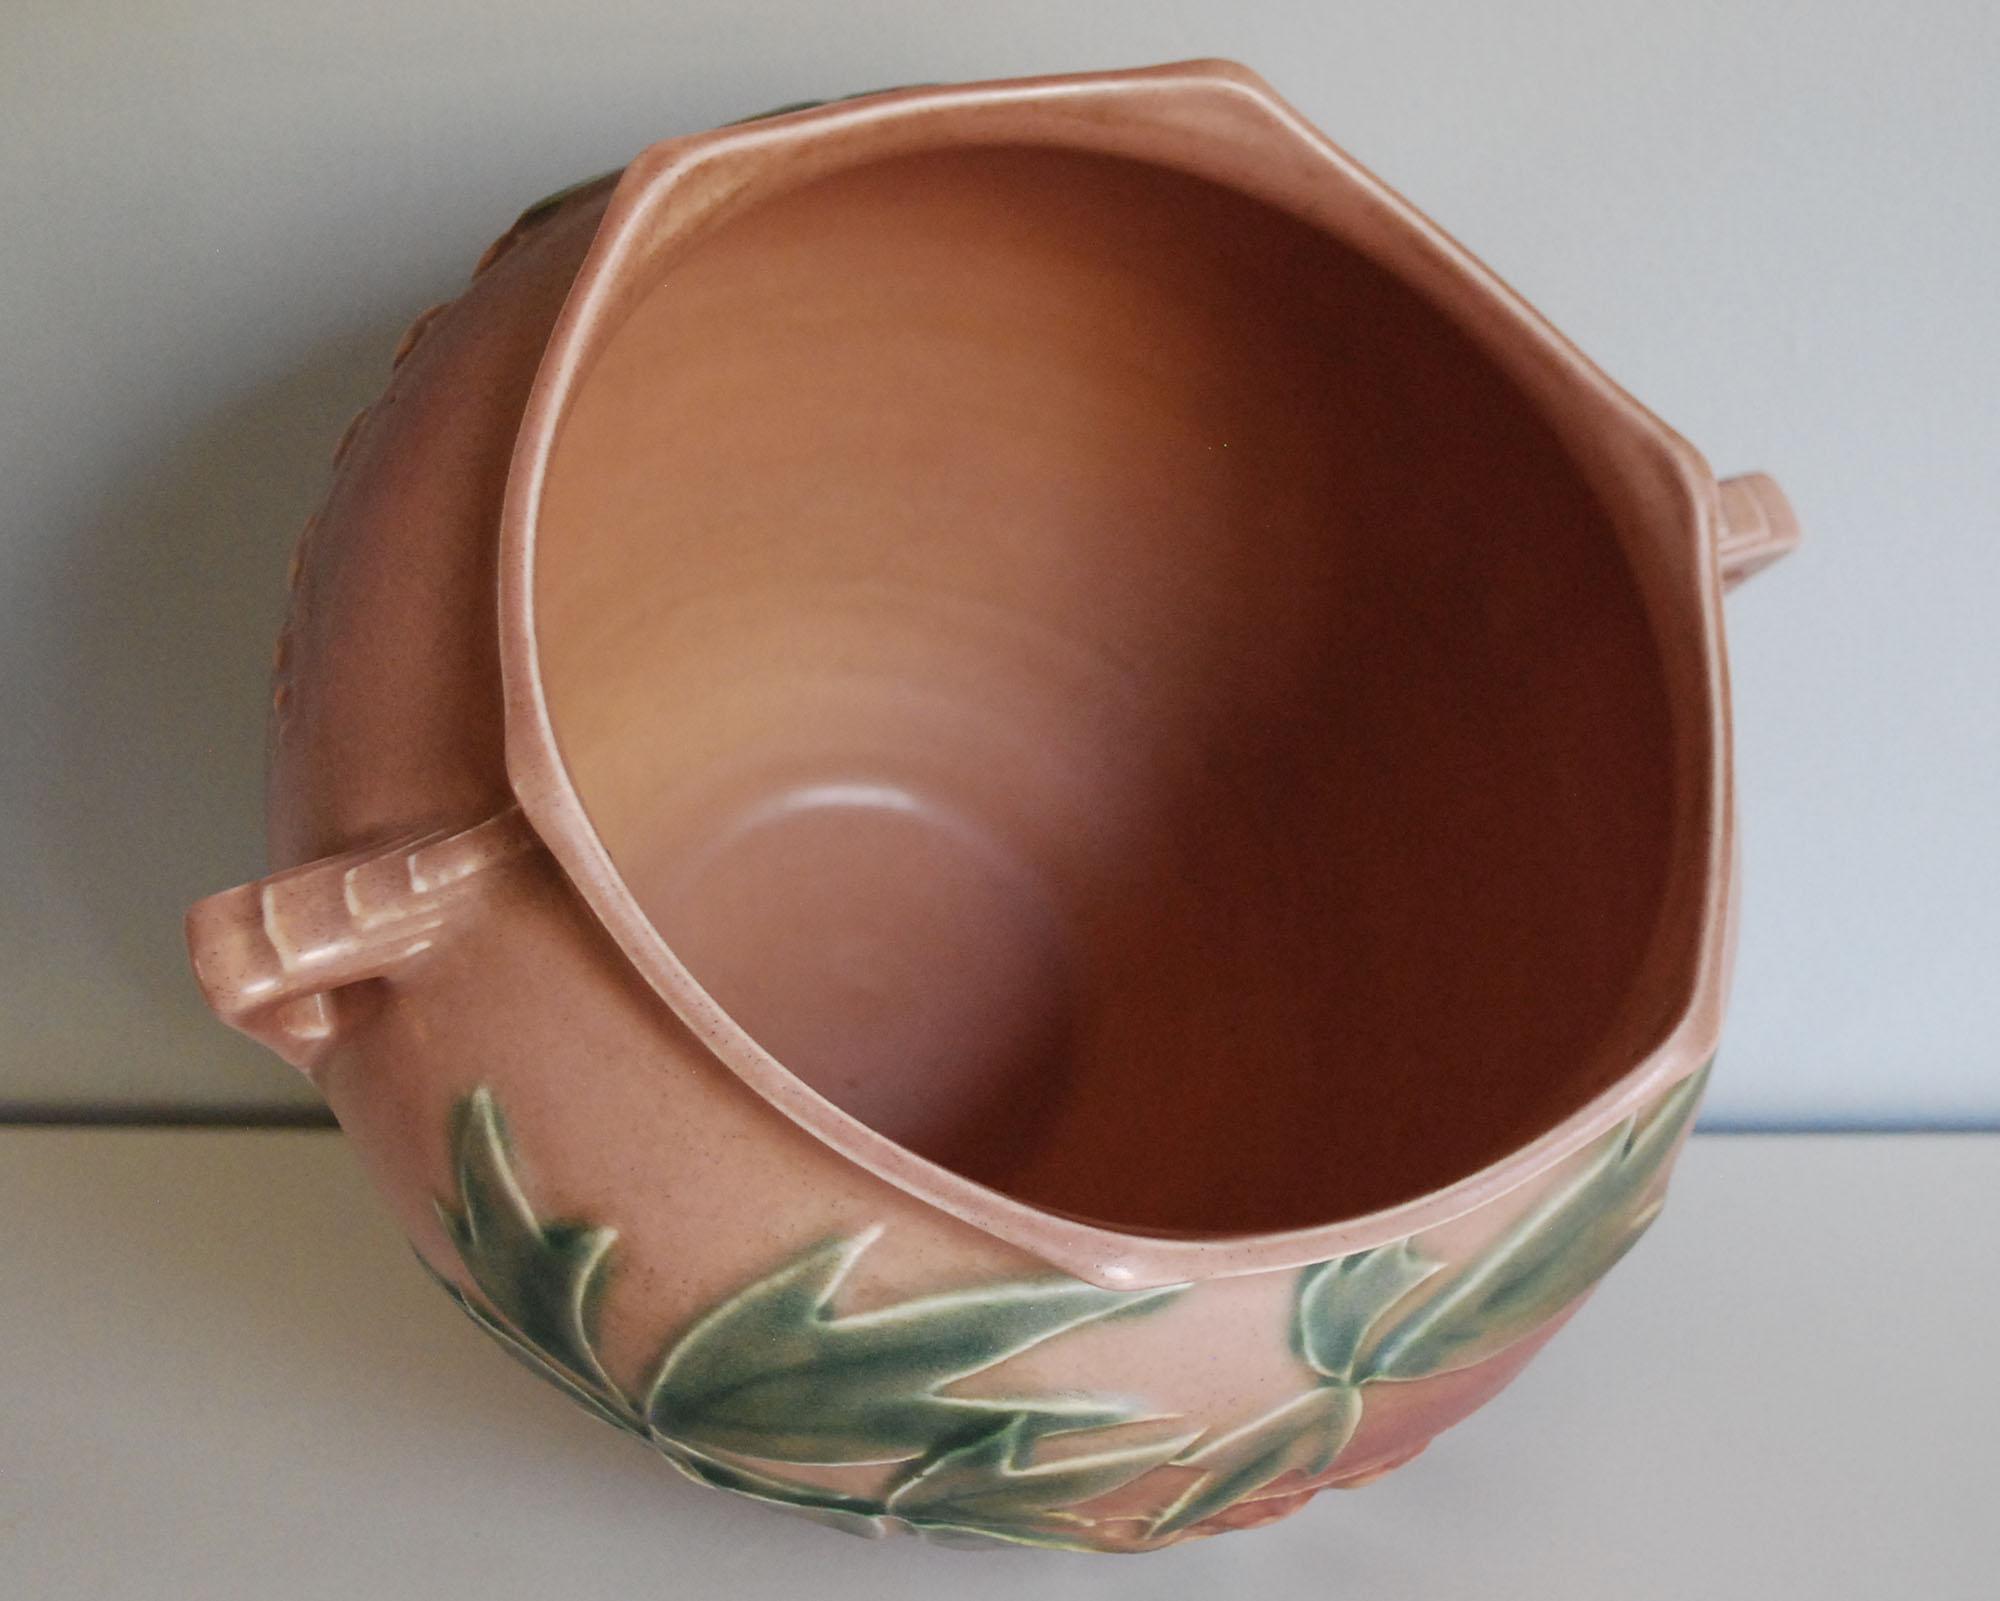 Vintage Pink Art Deco Planter or Vase Roseville Bleeding Heart Jardeniere 1930s Ceramic Pottery Planter 651-7